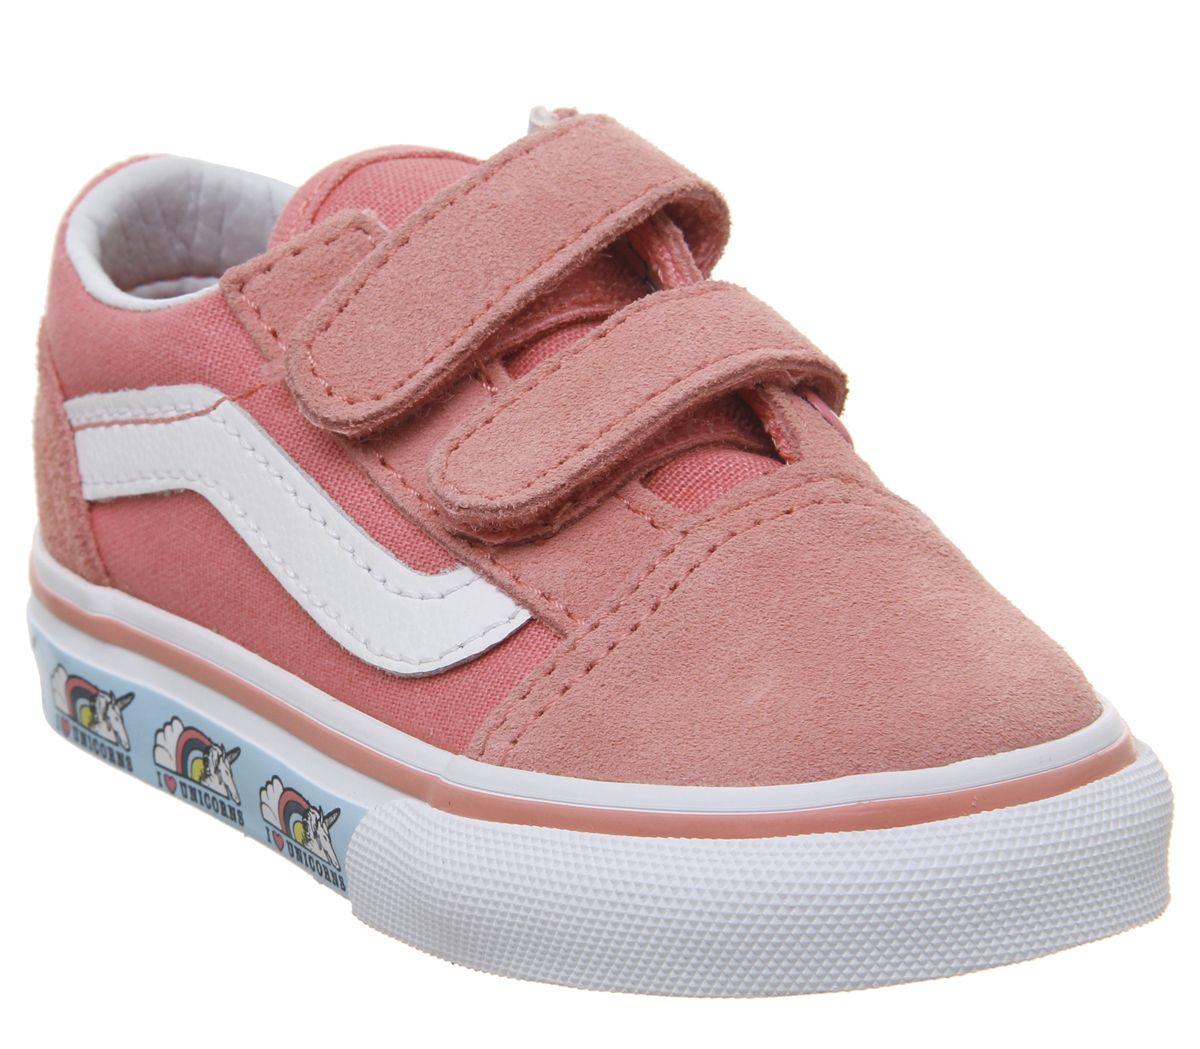 a7c59c55b1 Vans Old Skool (t) Trainers Strawberry Pink True White Unicorn - Unisex